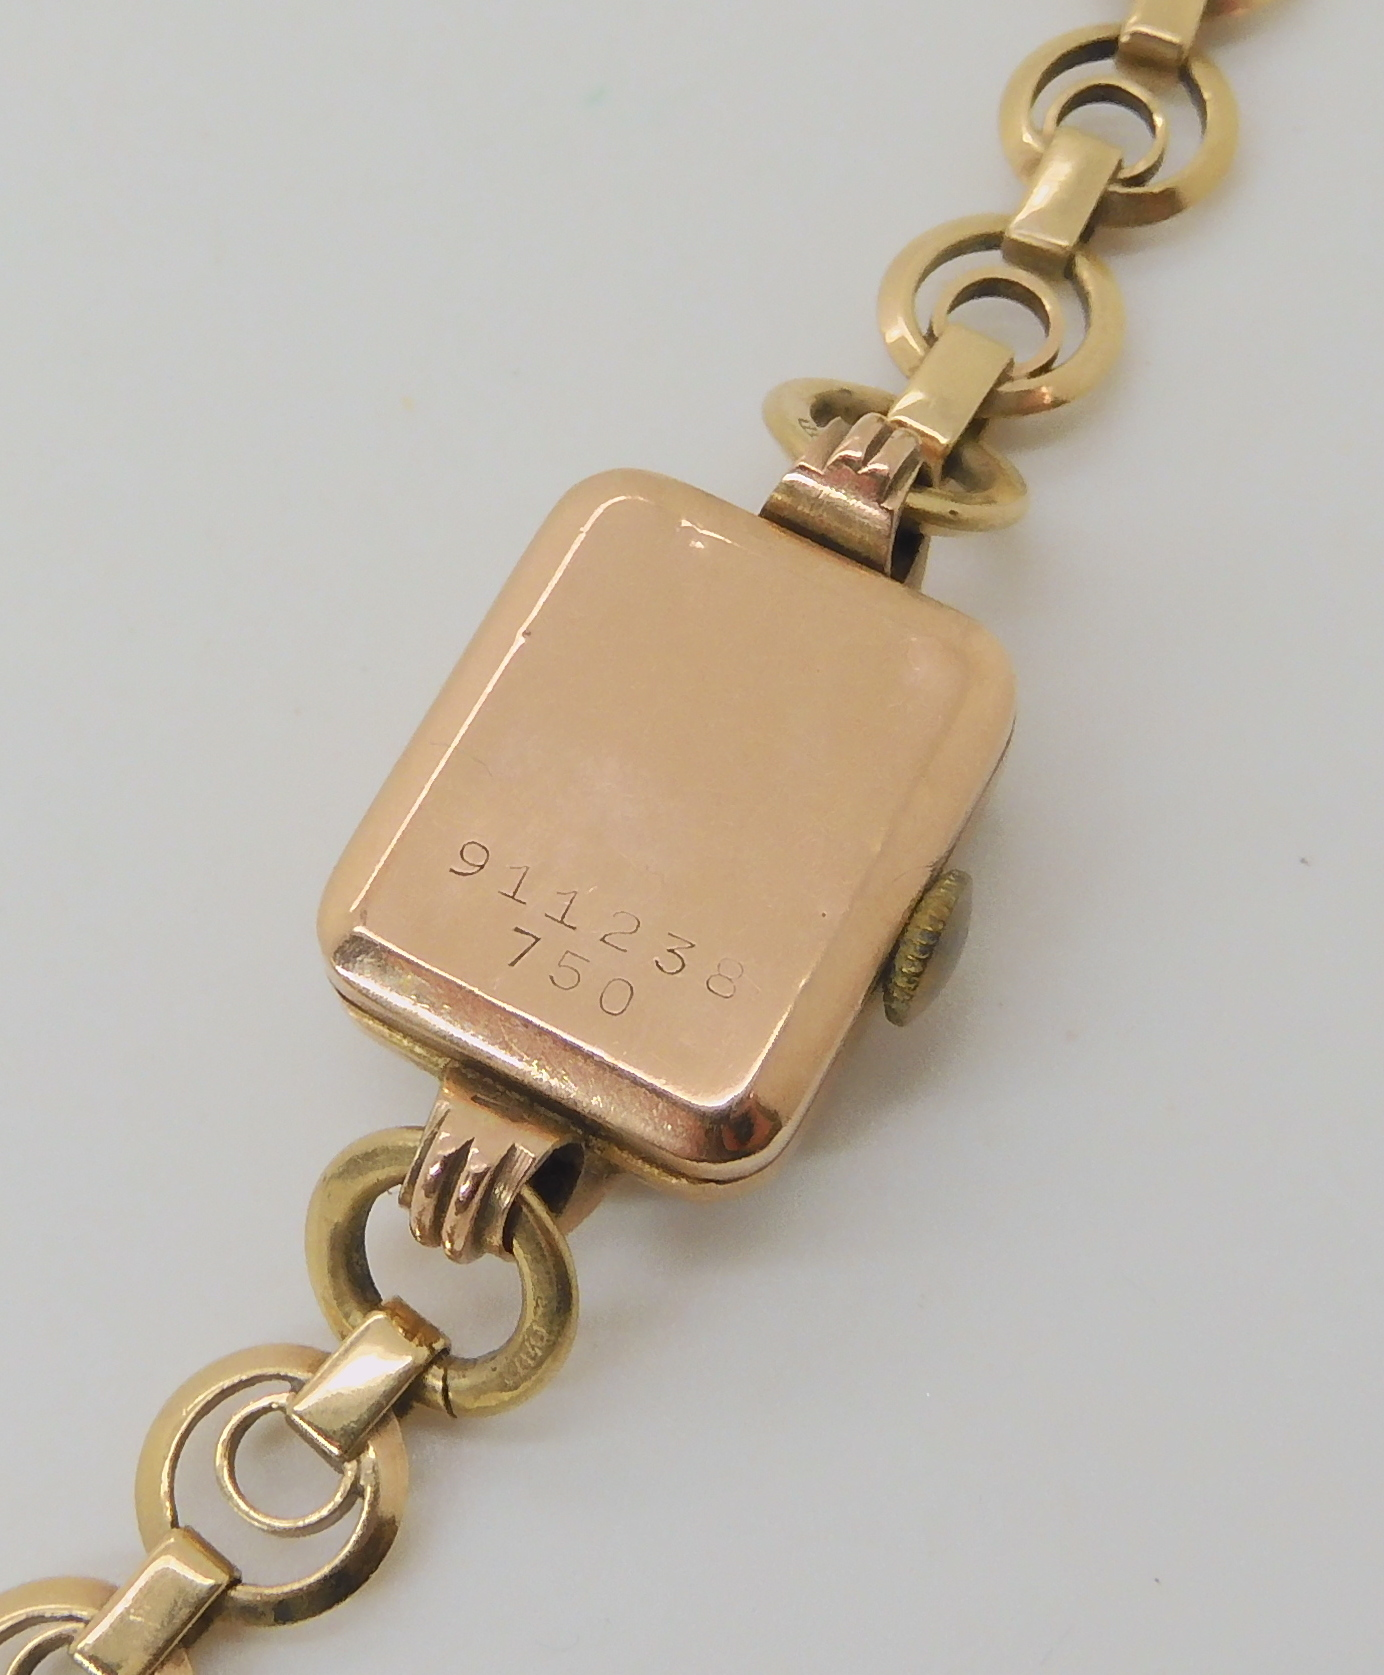 A 9CT GOLD LADIES TUDOR WRISTWATCH the dial signed Tudor Dobbies Ltd Nairobi. with black roman - Image 2 of 3